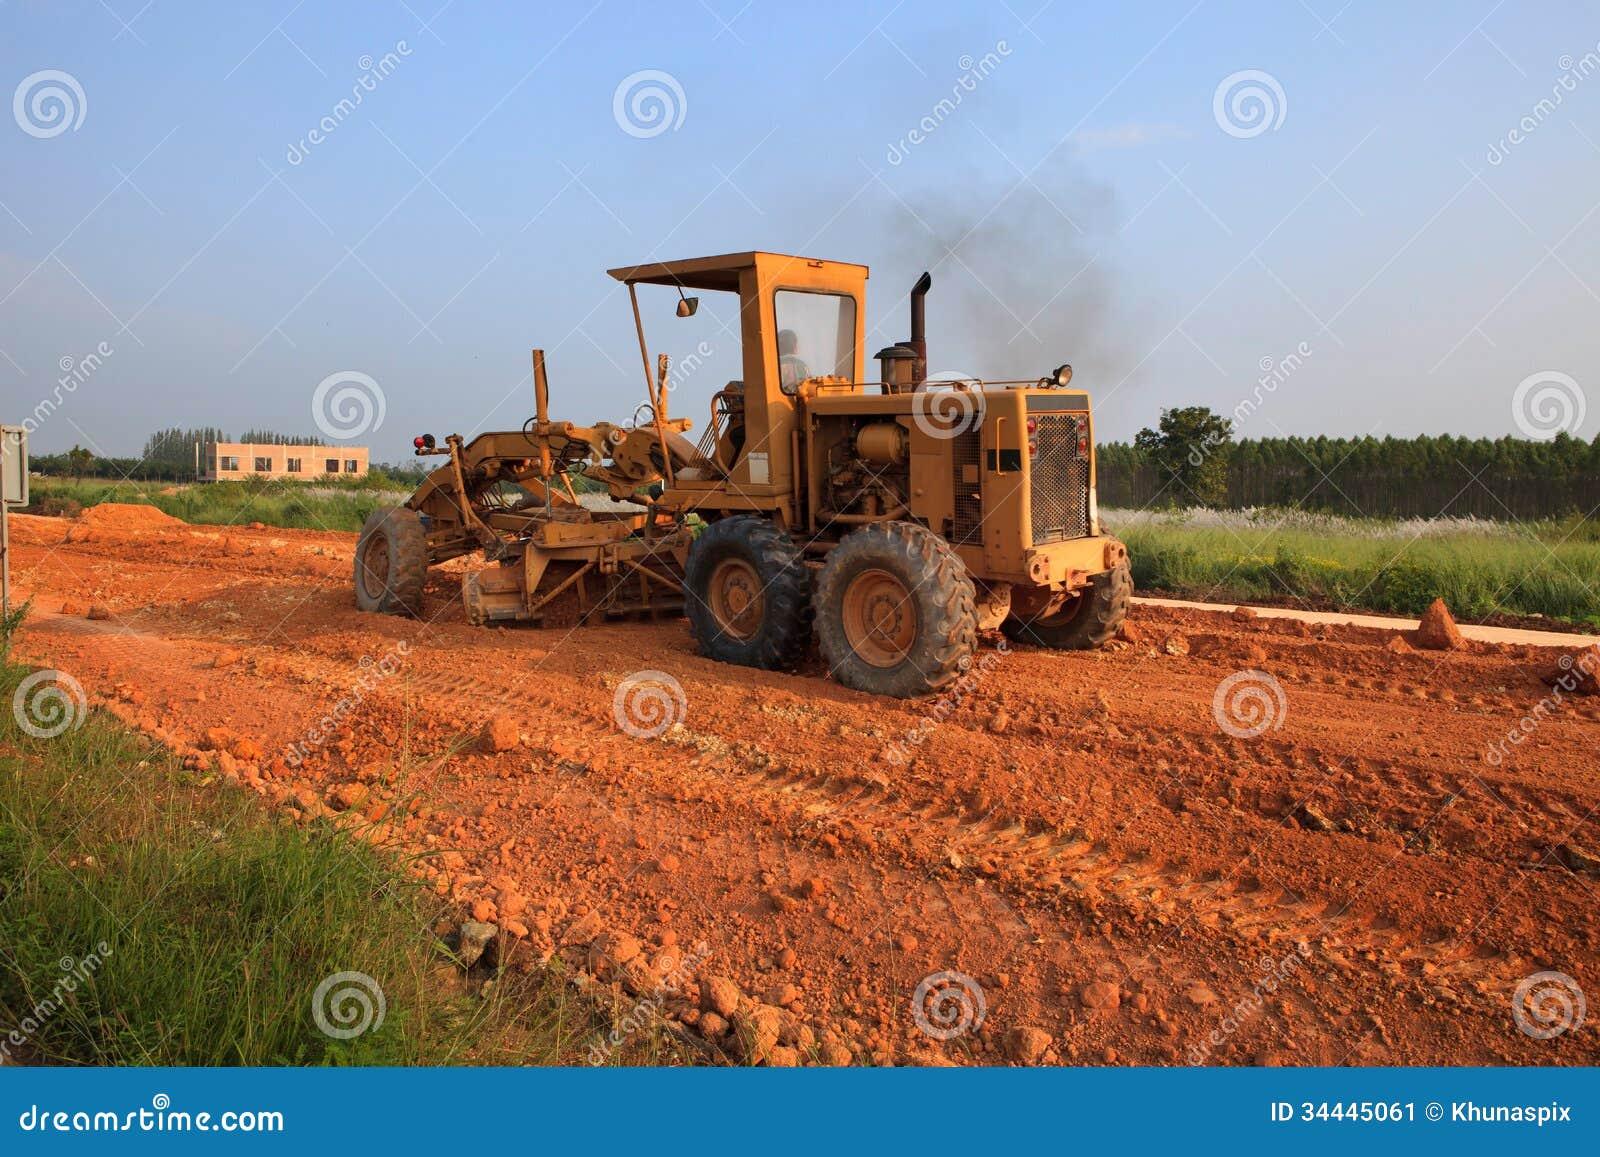 the machine site